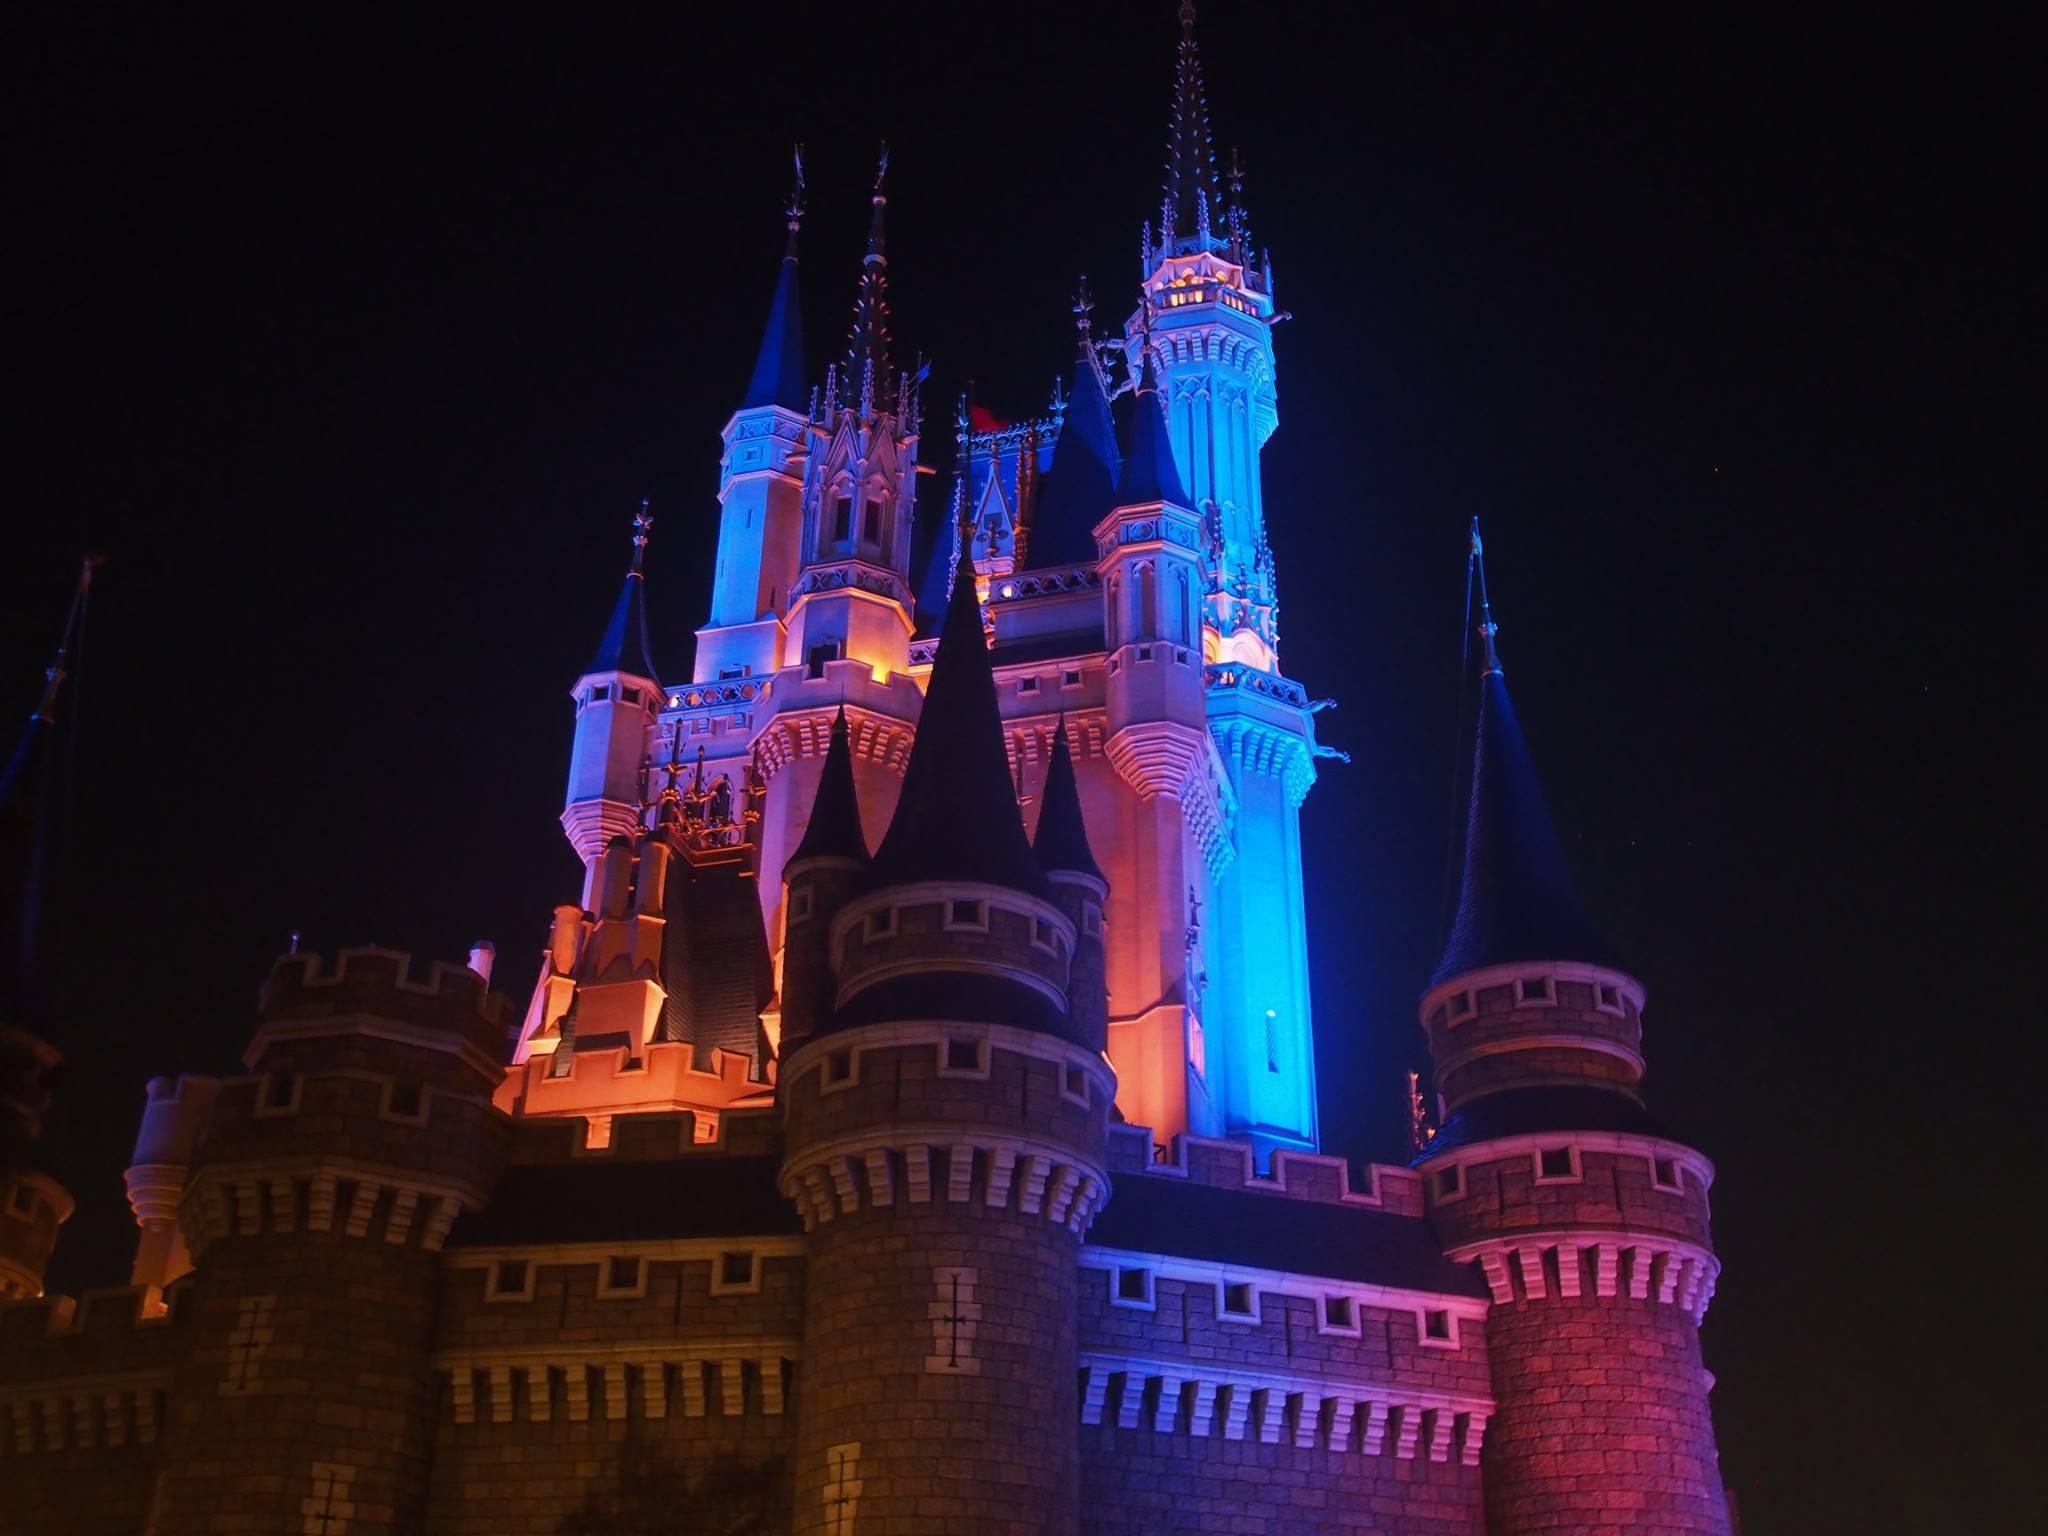 disneyland castle at night tokyo